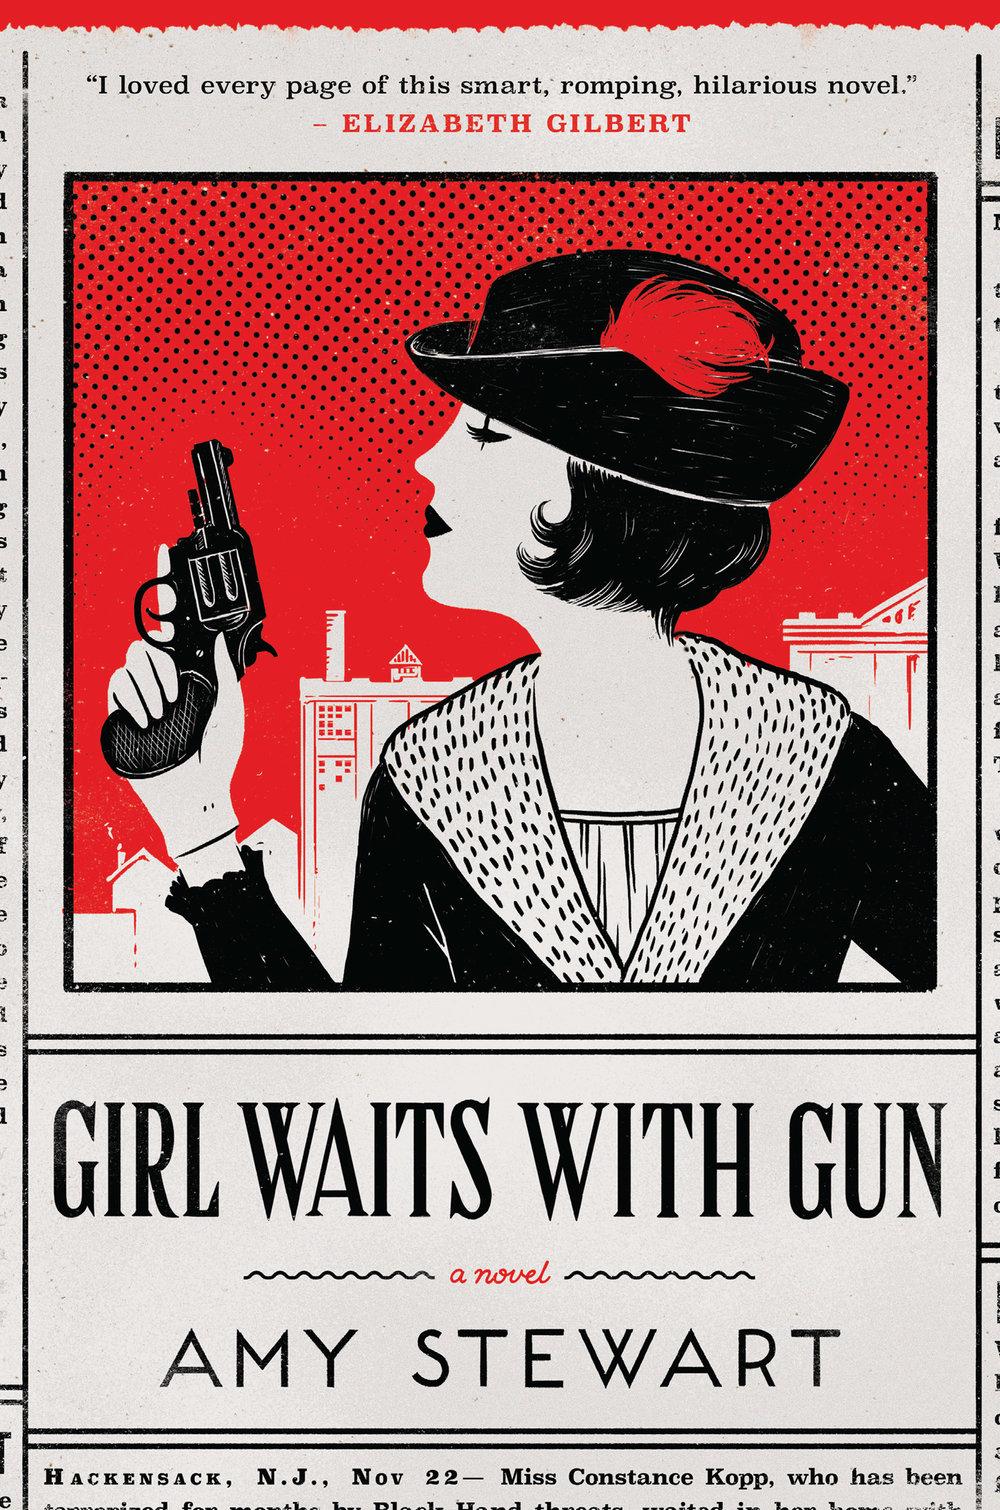 stewart_girl-waits-with-gun_hres.jpg